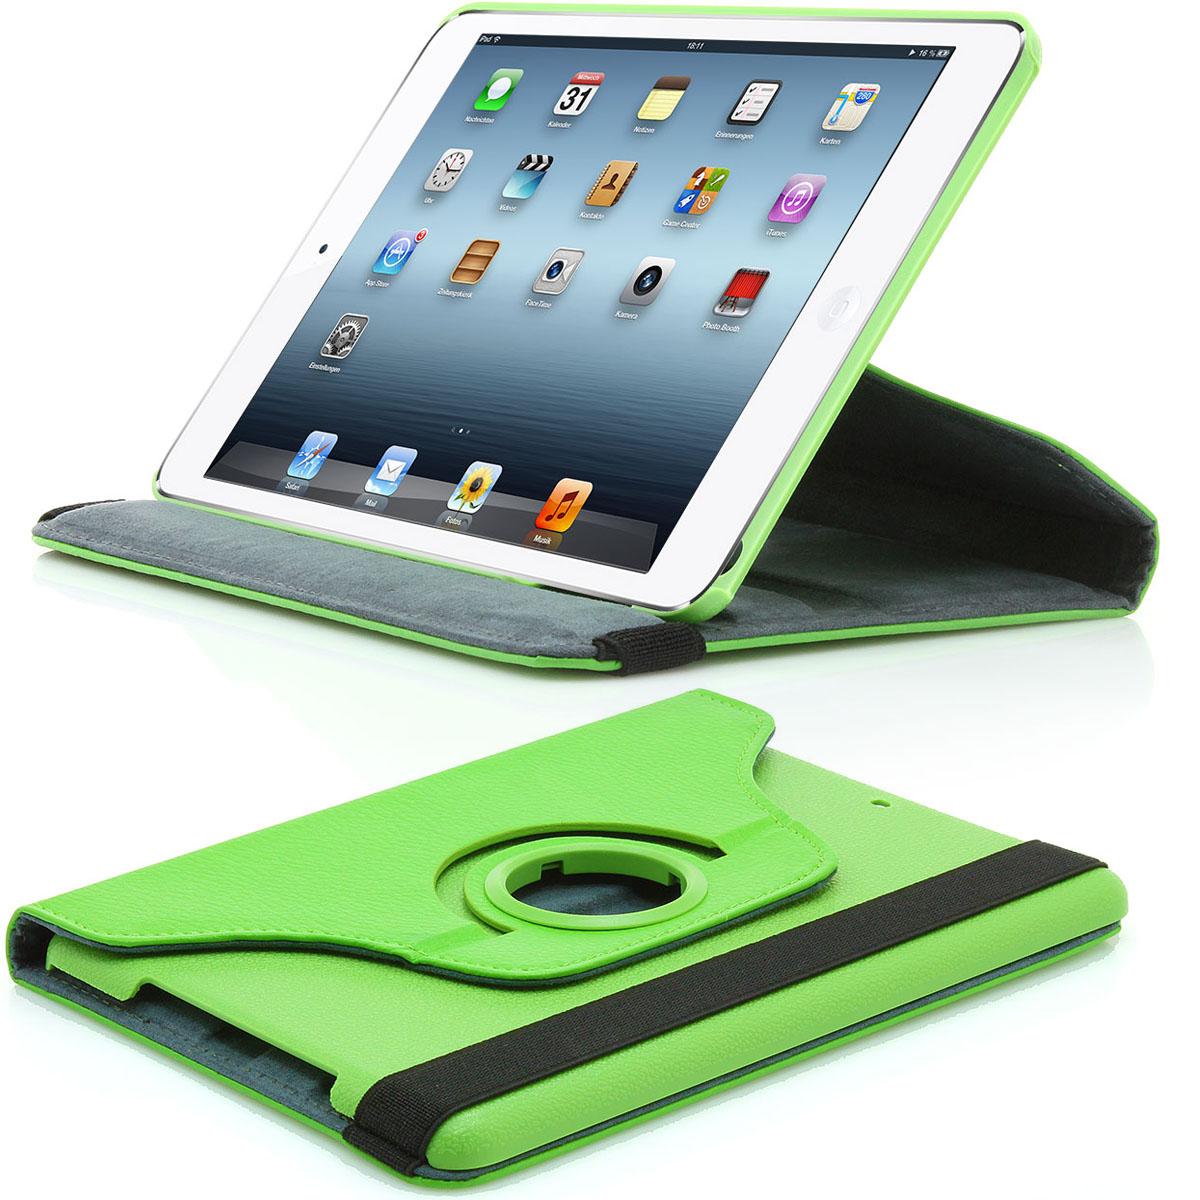 XAiOX iPad Mini Tasche 360° drehbar - grün